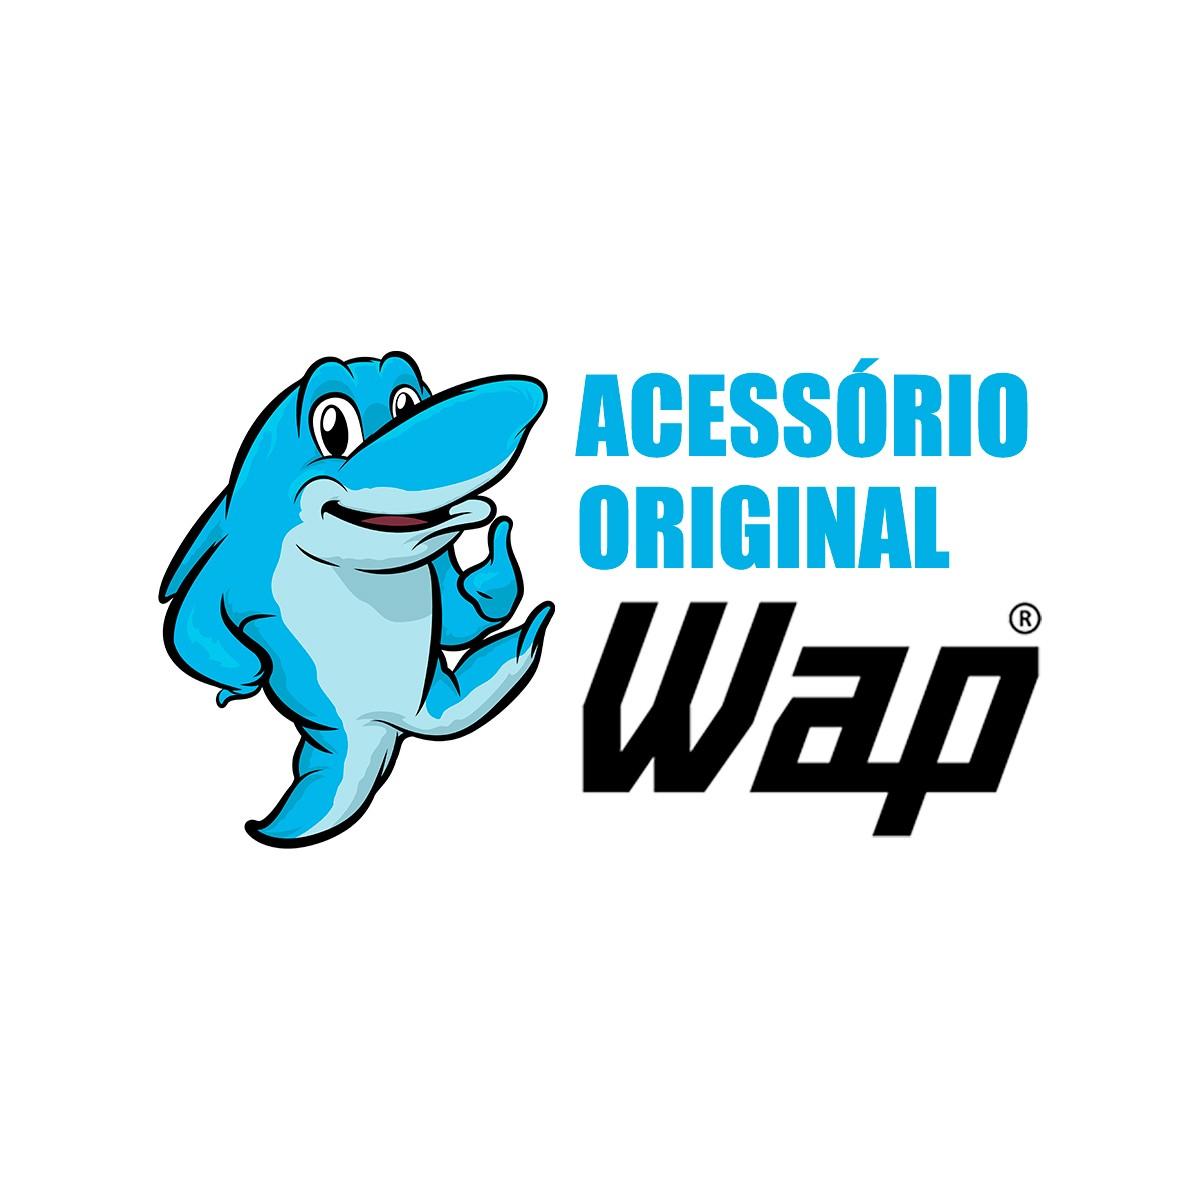 Kit Saco descartável para Aspirador Wap Silent Power, Profi 10, Aero Plus 10, ST10, ST15 03 unidades Original